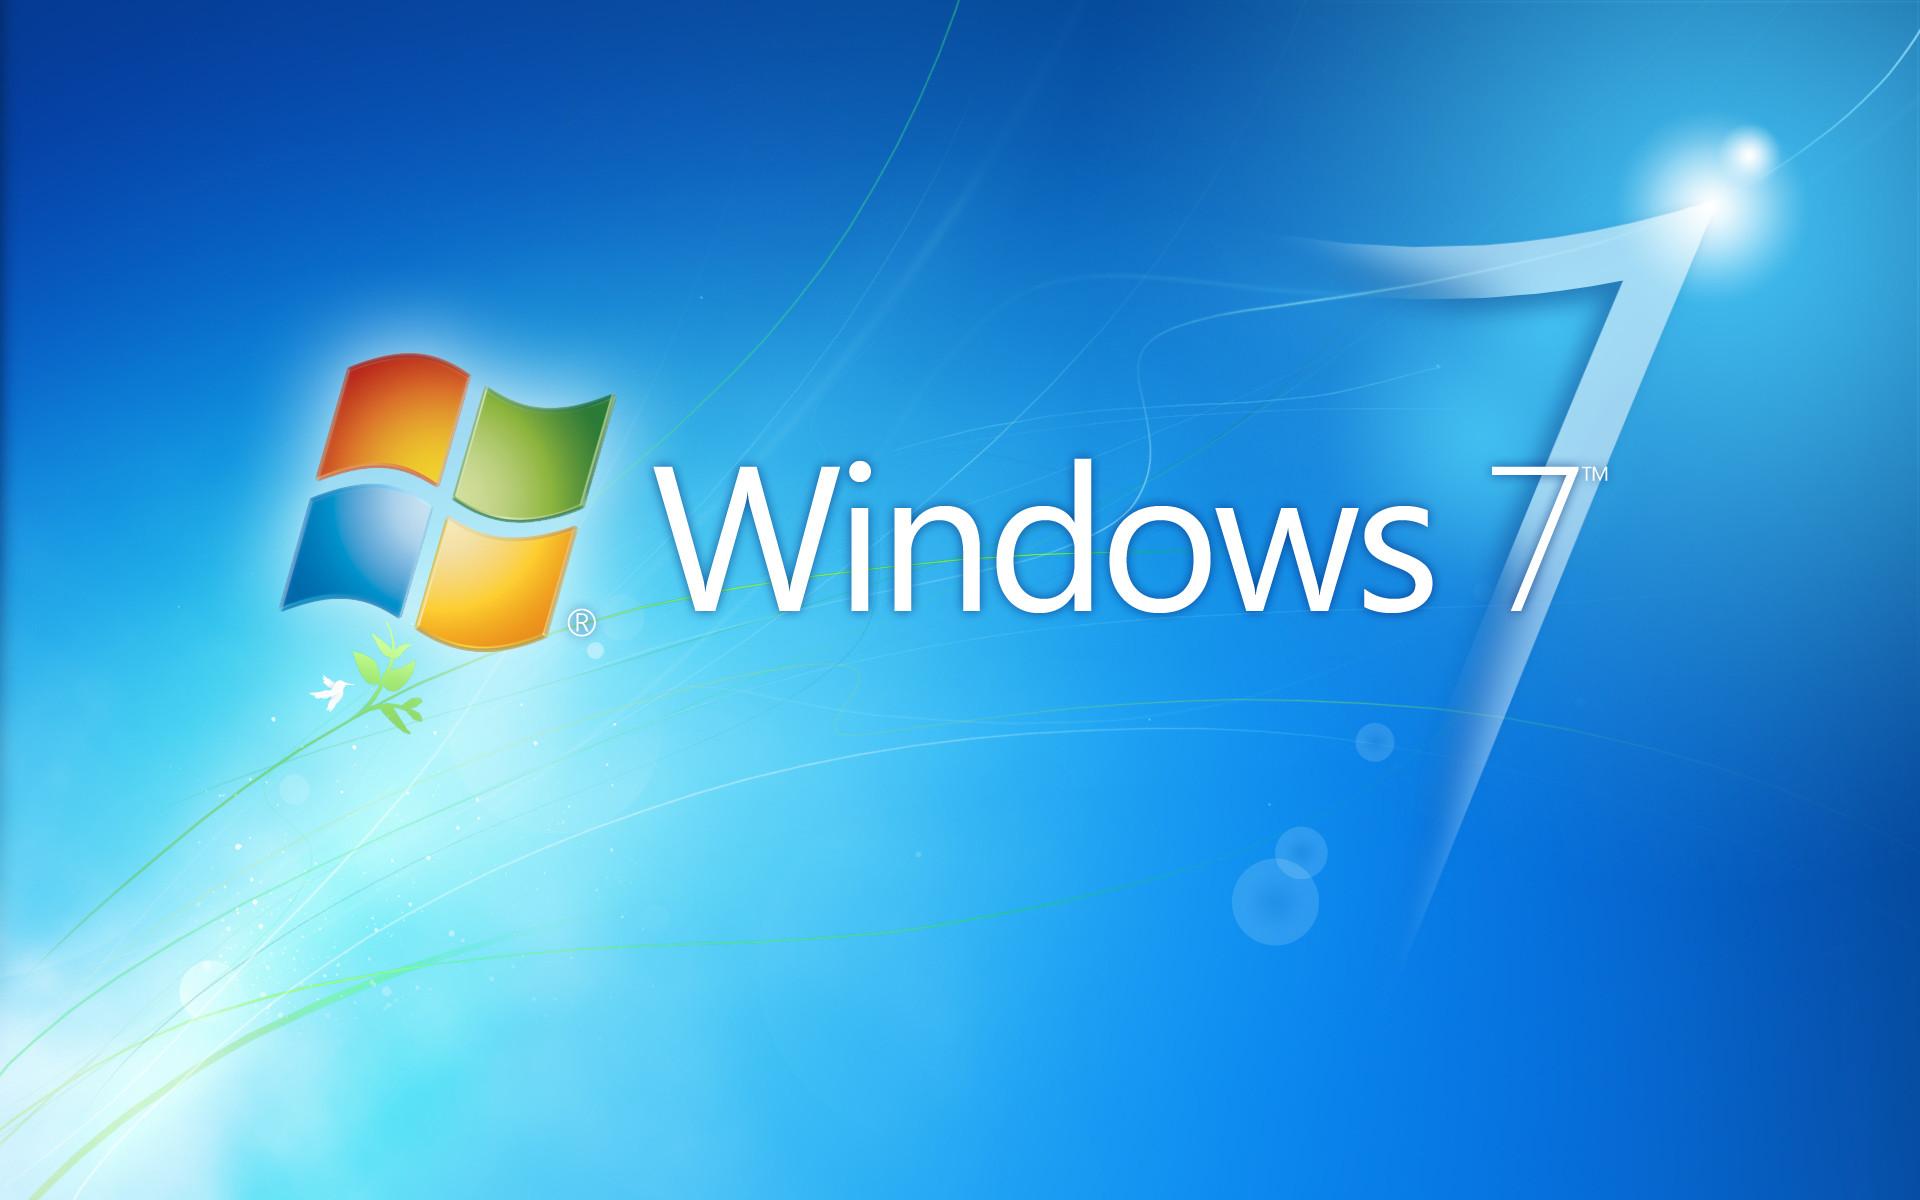 Res: 1920x1200, WINDOWS 7 BASIC WINDOWS 7 HOME WINDOWS 7 HOME PREMIUM x86 x64 WINDOWS 7  PROFESSIONAL x86 x64 WINDOWS 7 ULTIMATE x86 x64 Windows 7 is a personal  computer ...